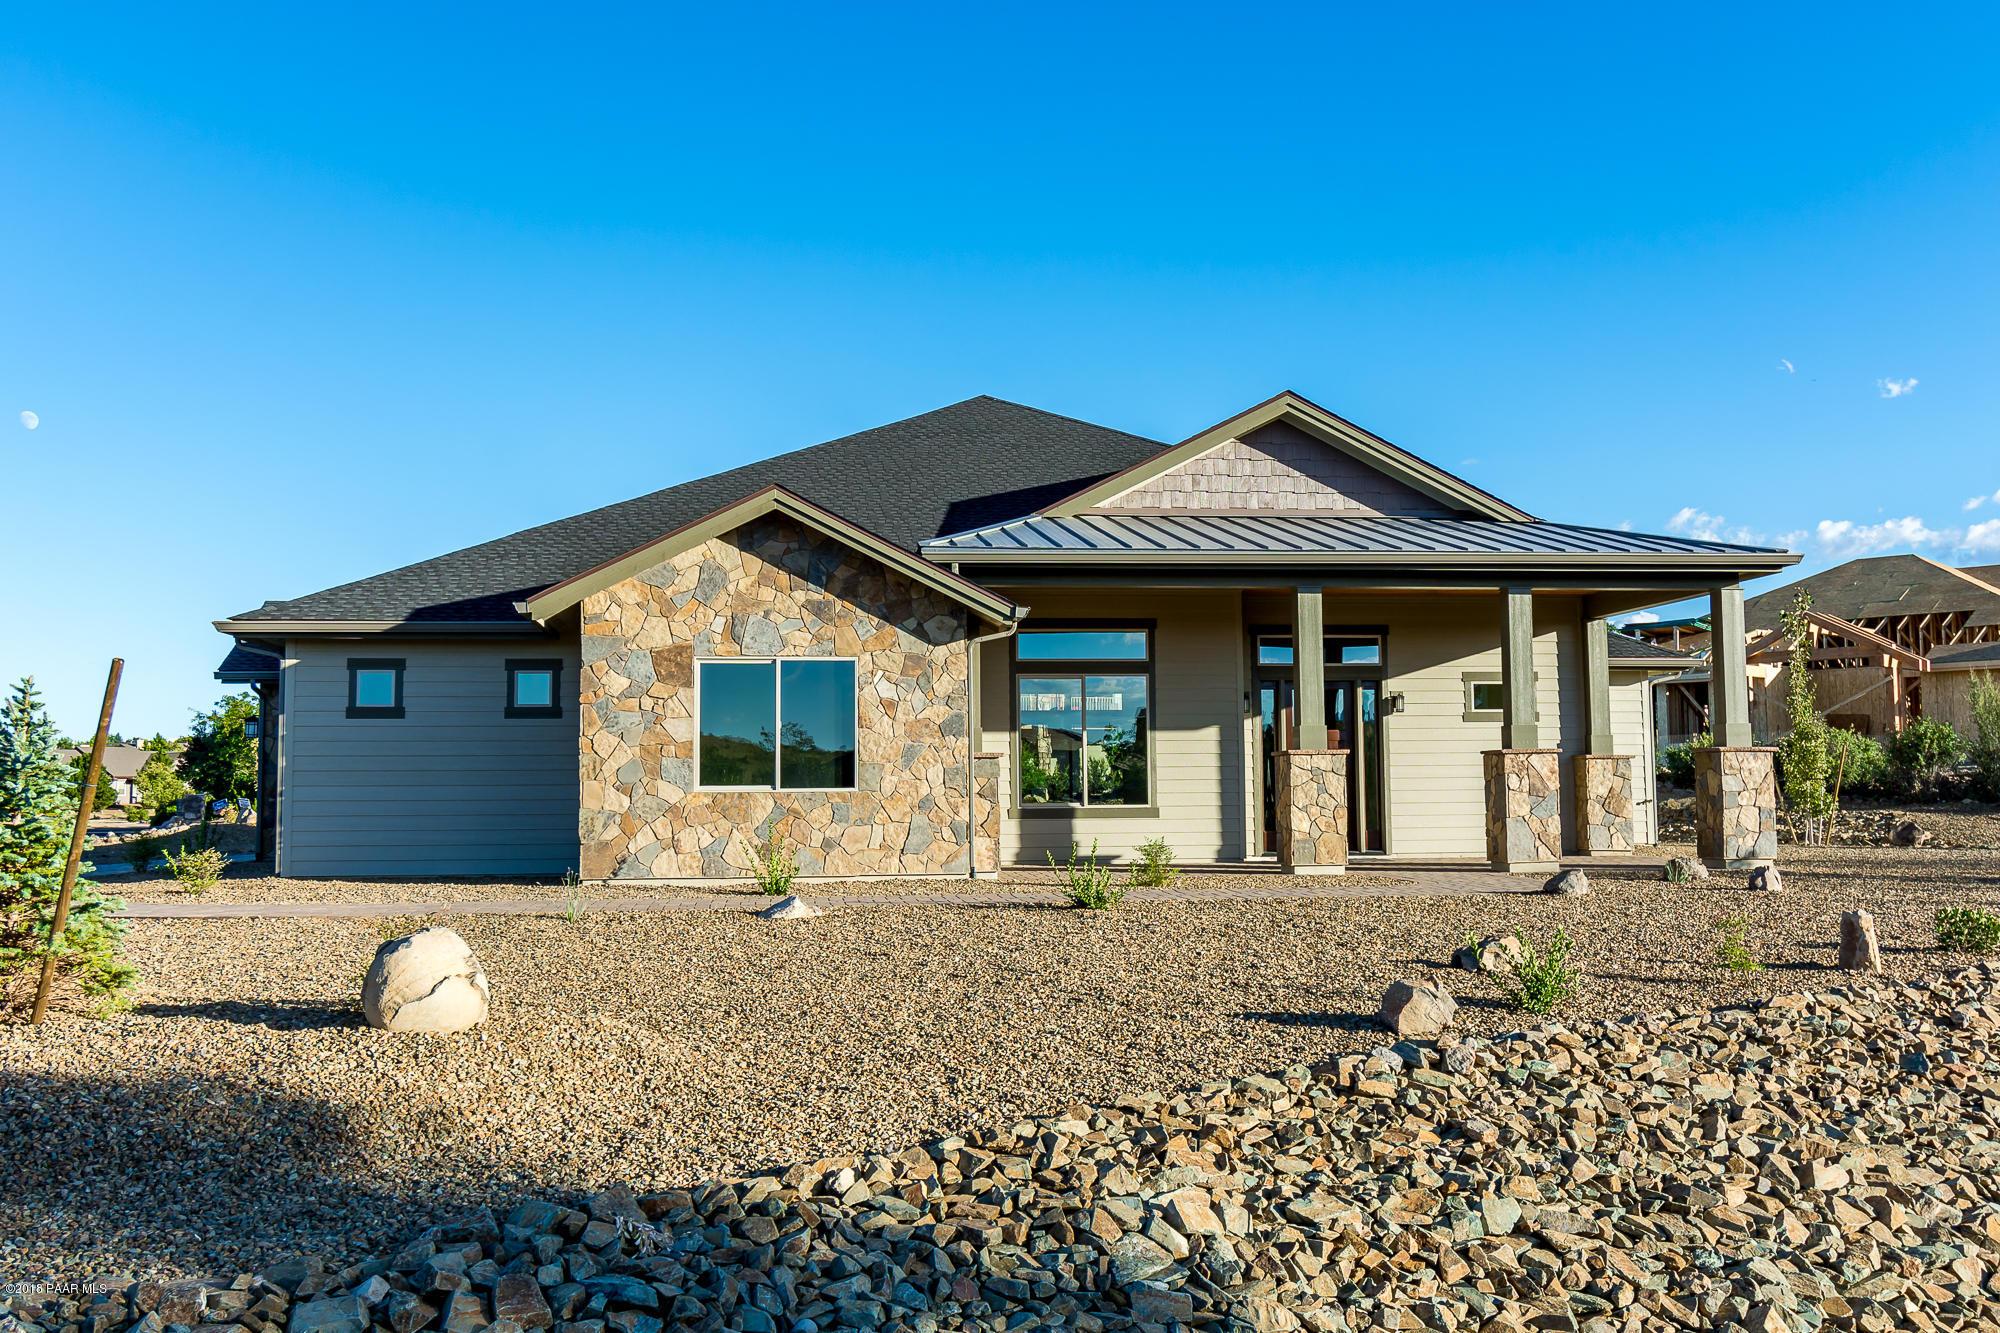 Photo of 1395 Claiborne, Prescott, AZ 86301